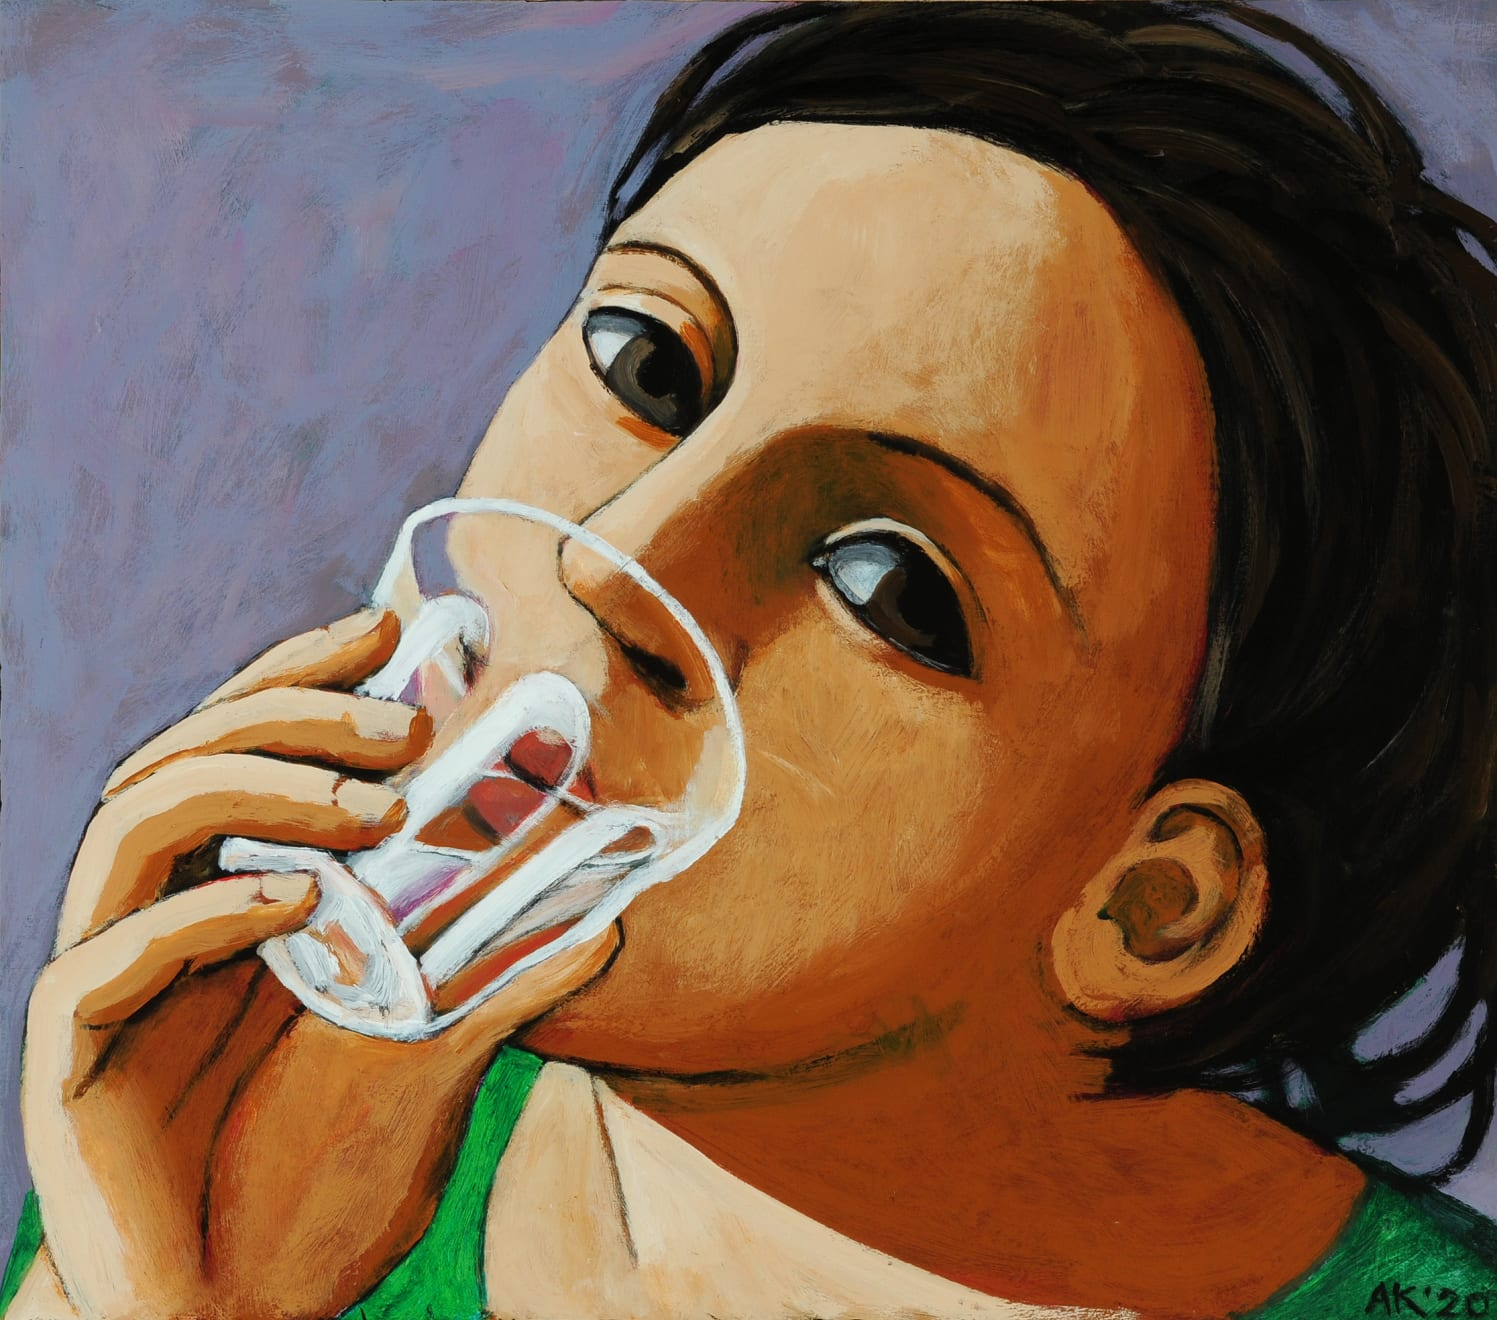 Anita Klein, A Glass of Water, 2020